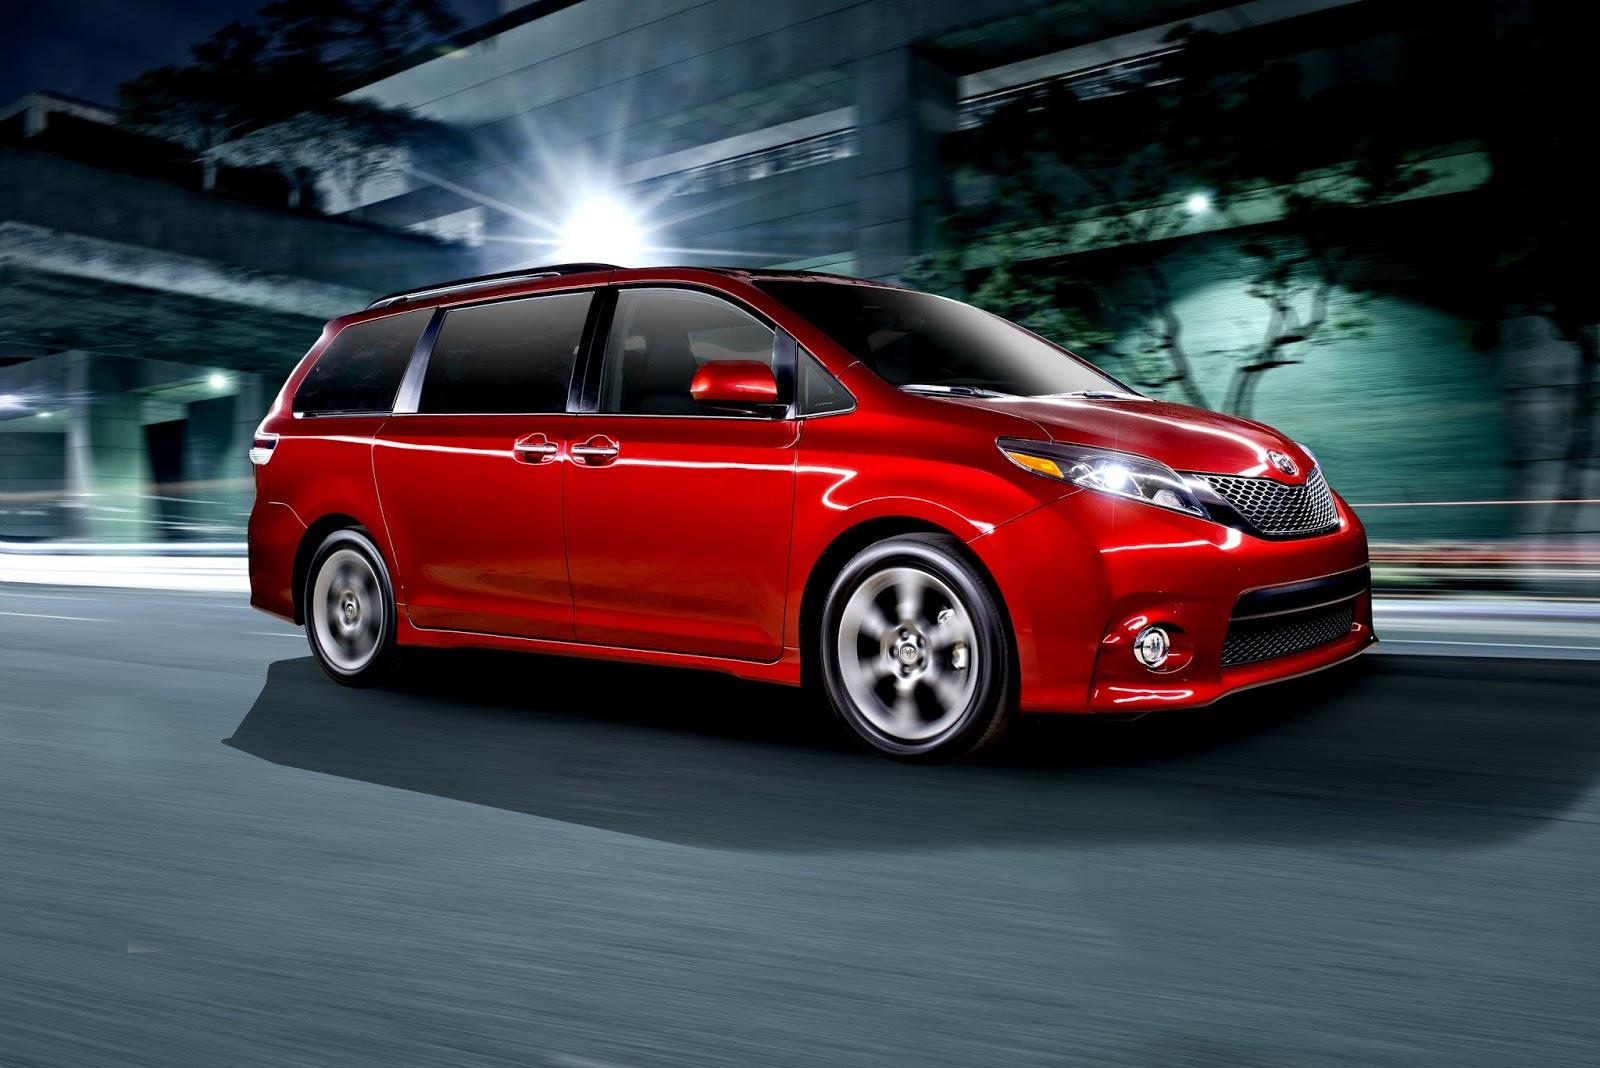 22507b0a3d Upcoming Cars 2015  Minivan Sales In America February 2015 YTD